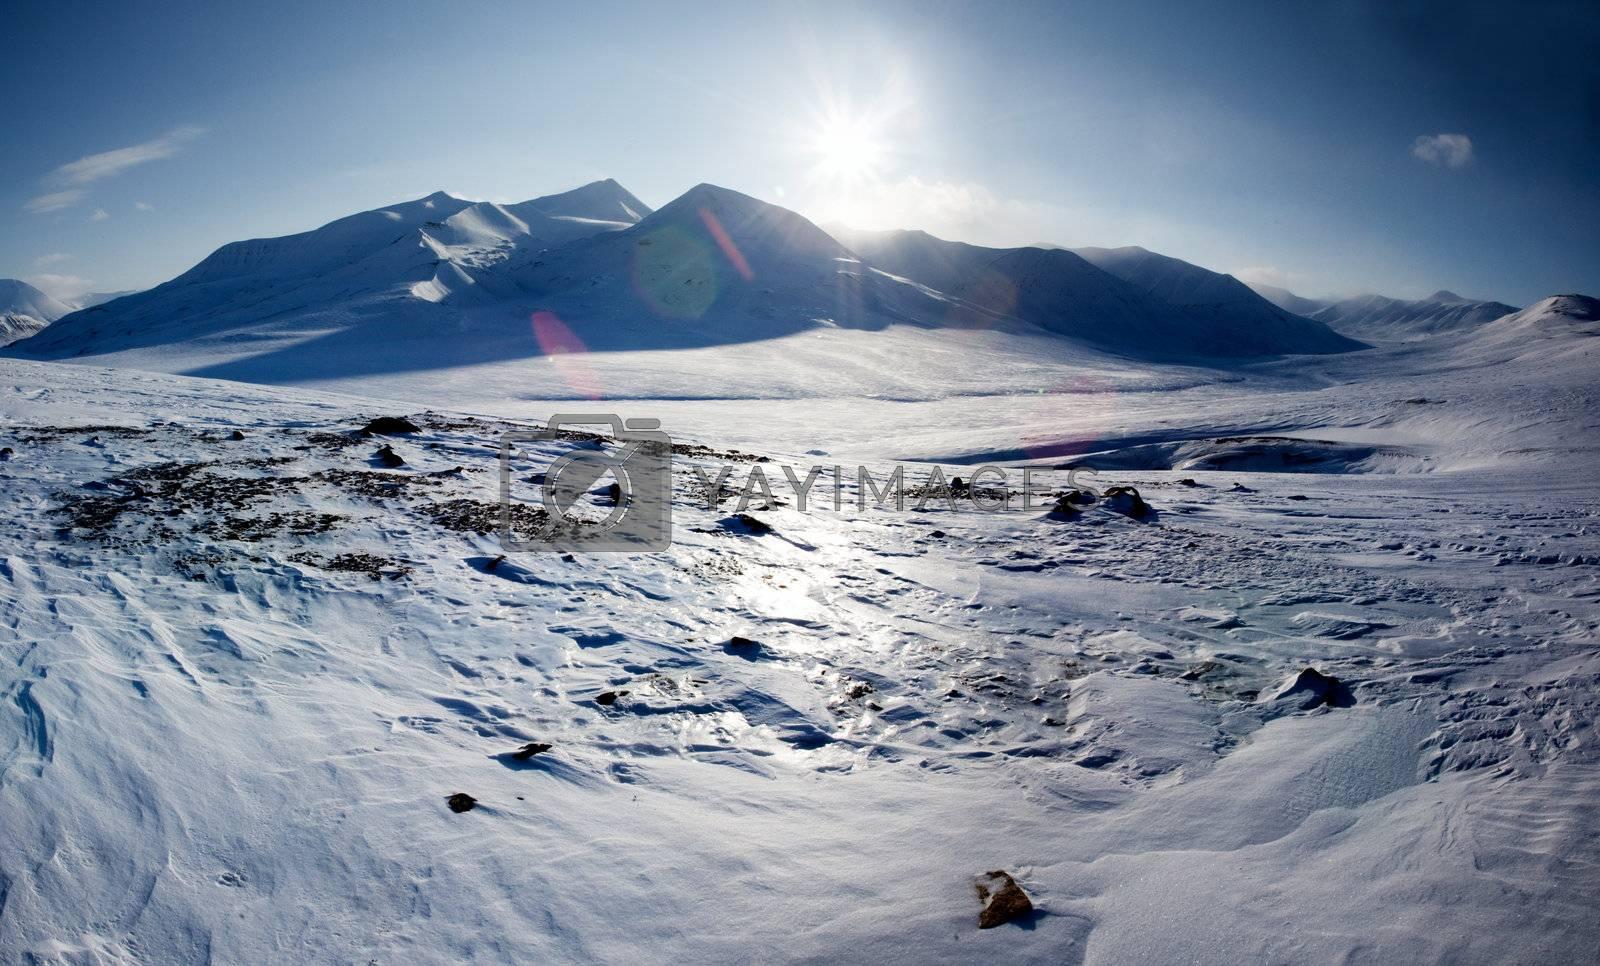 A mountain landscape on the Island of Spitsbergen, Svalbard, Norway